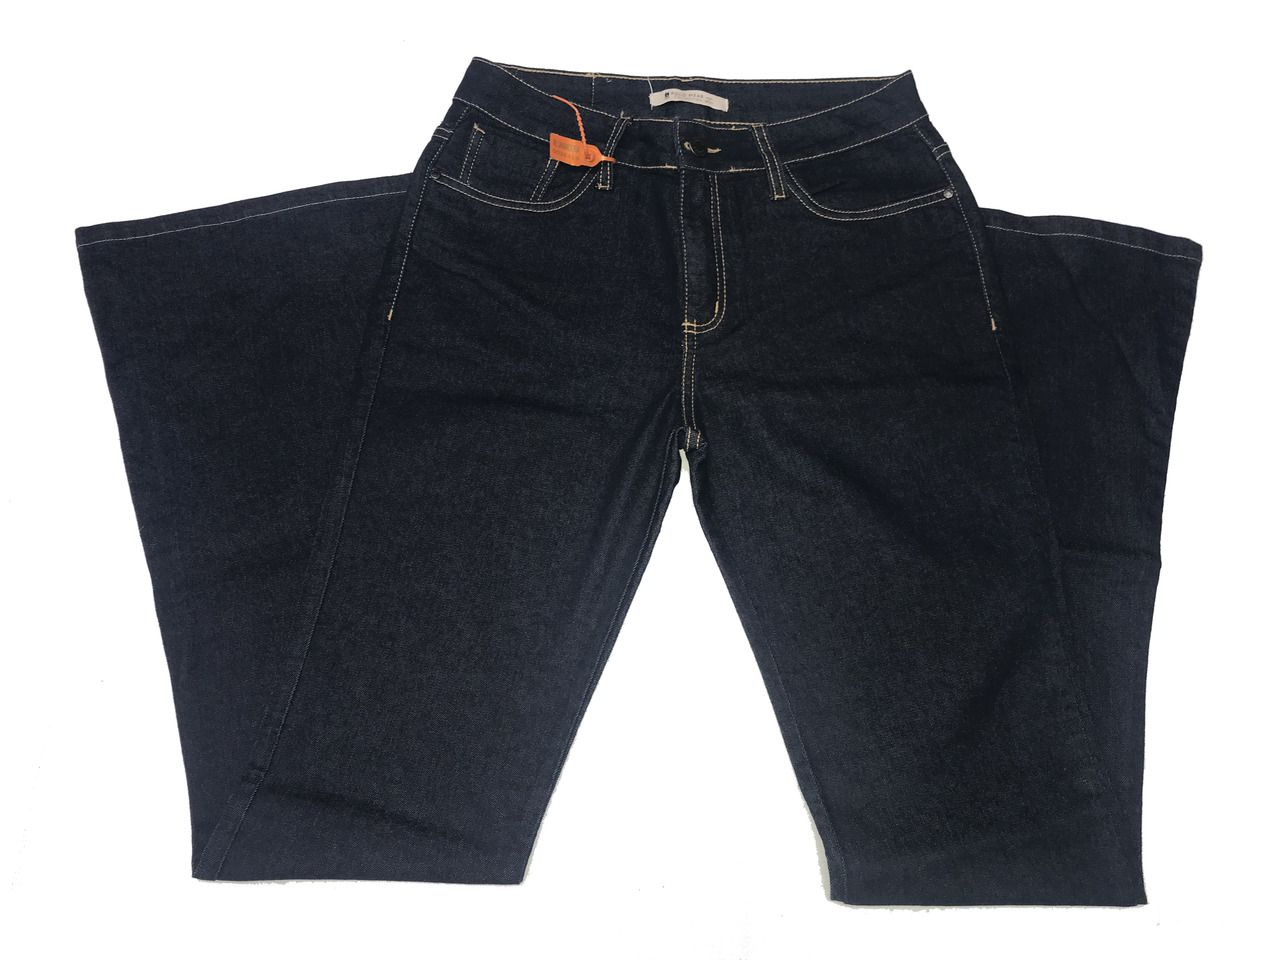 Calça Jeans Flare Feminina  - Boutique Mangalarga